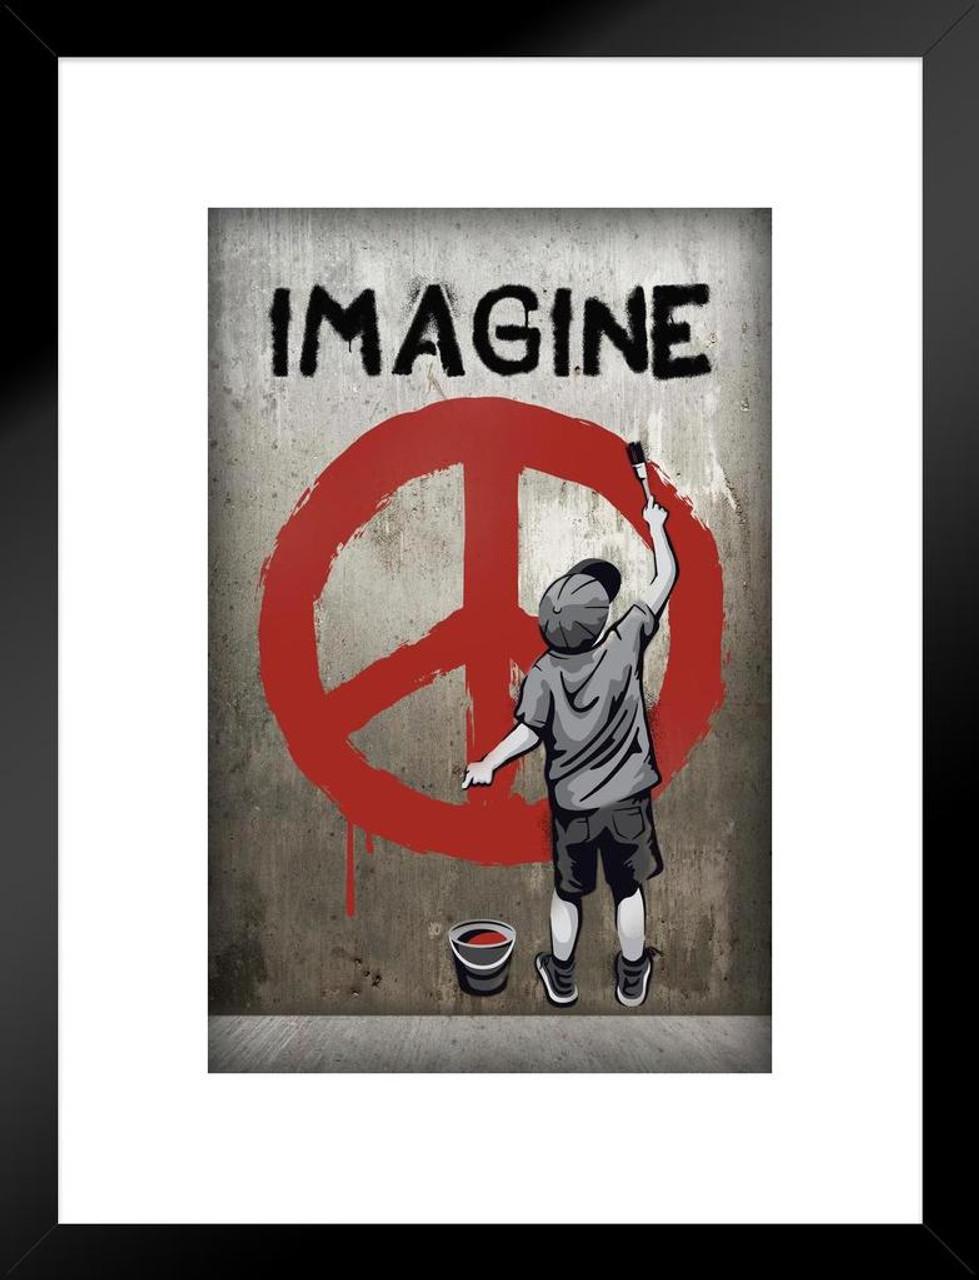 Children are Motivational Art Print Framed Poster 14x20 inch Poster Foundry